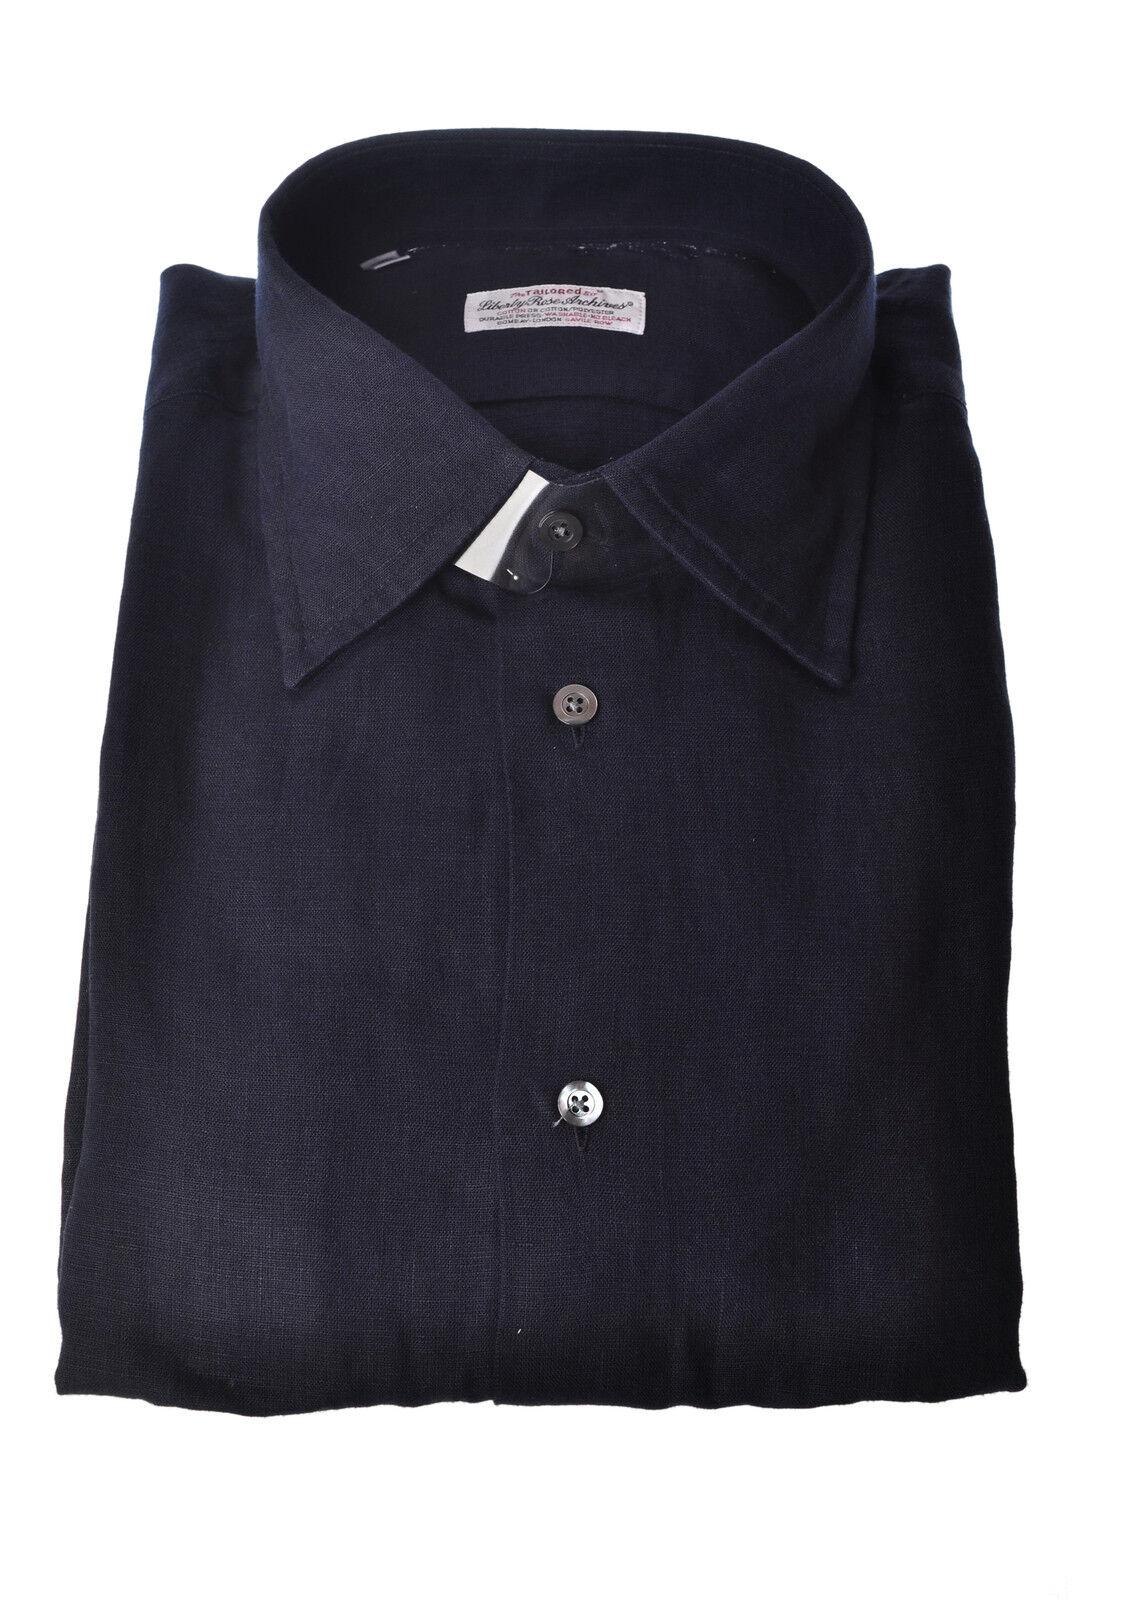 Liberty Rose - Blusen-Shirt - Mann - Blau - 3463717D184435